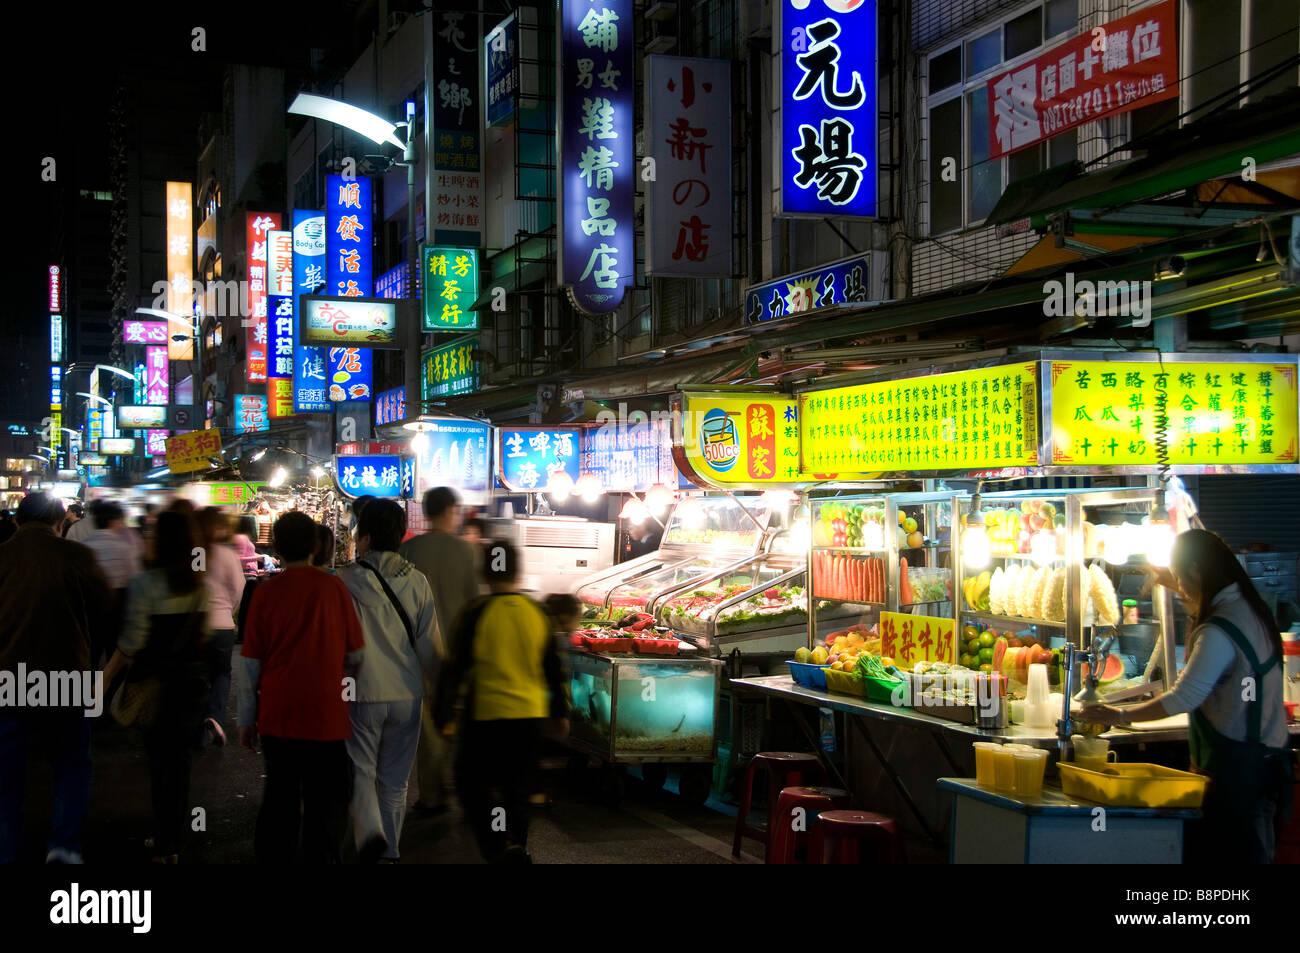 Taiwan Snack - Stock Image